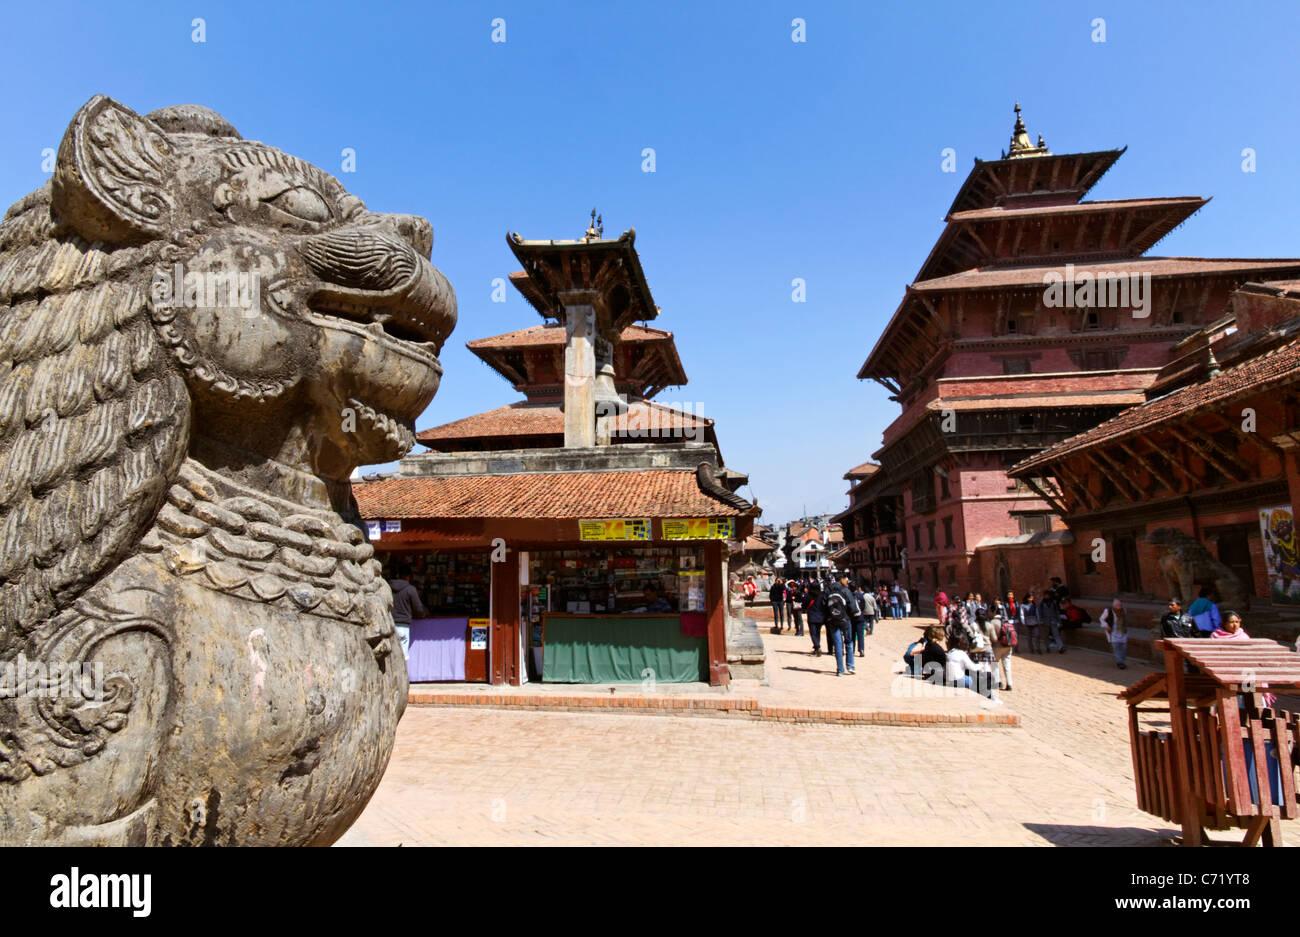 Lion statue in Durbar Square, Patan, Nepal - Stock Image